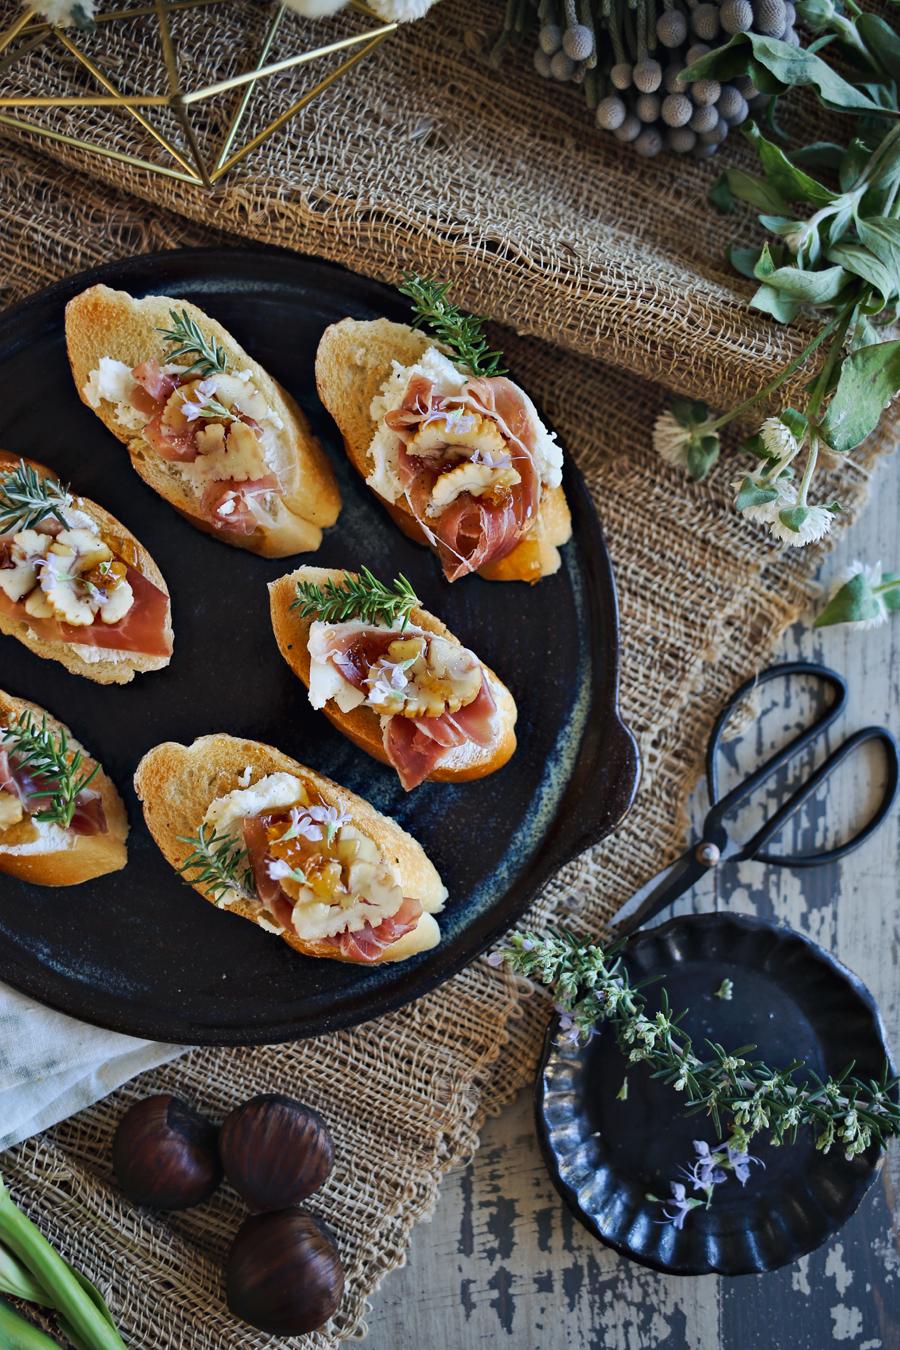 Roasted-Rosemary-Chestnut-Crostini-Recipe-Dine-X-Design.jpg